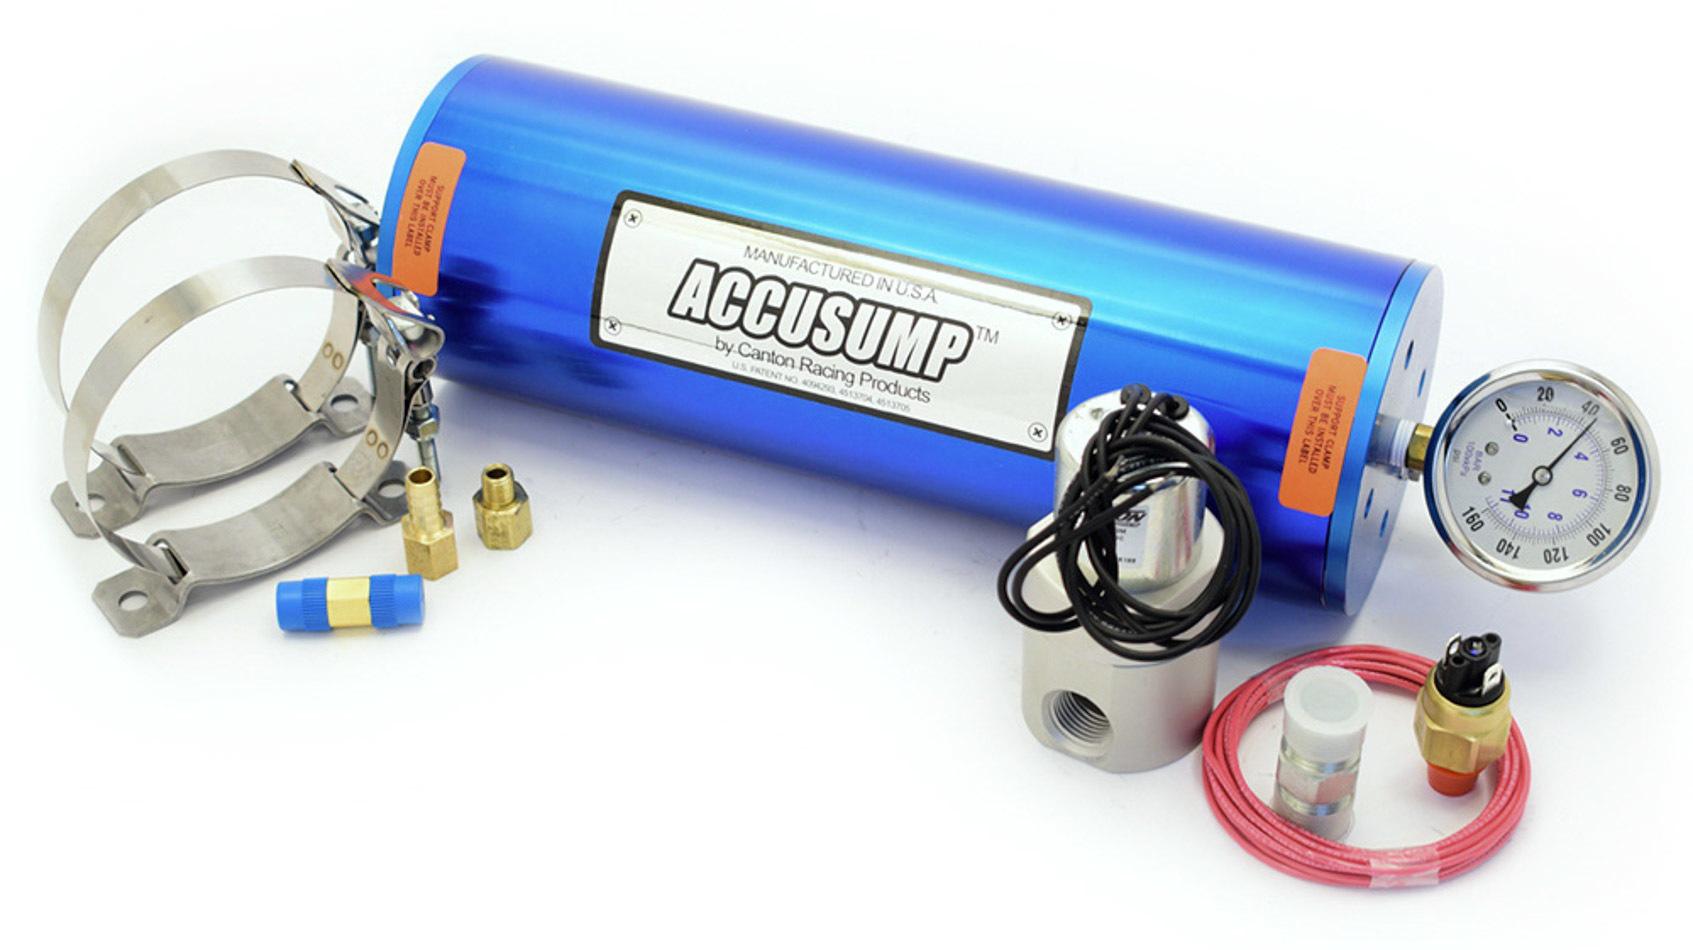 Canton 24-126 Oil Accumulator, Accusump, 2 qt Capacity, 4-1/4 in Diameter, 12 in Long, Aluminum, Blue Anodized, Each